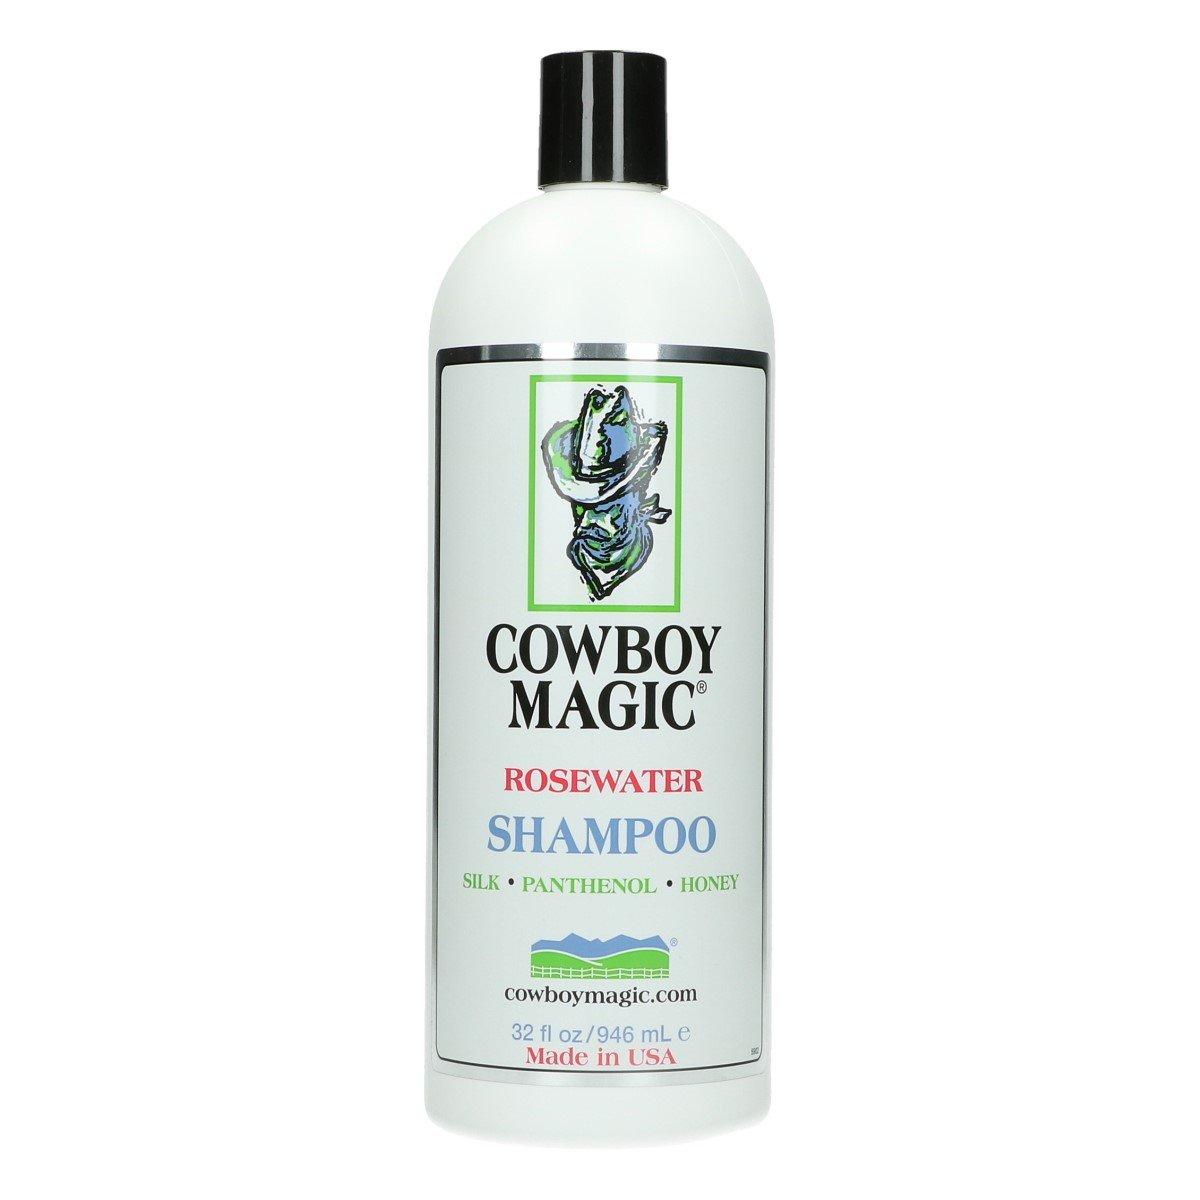 Afbeelding van Cowboy Magic Rosewater Shampoo 946ml